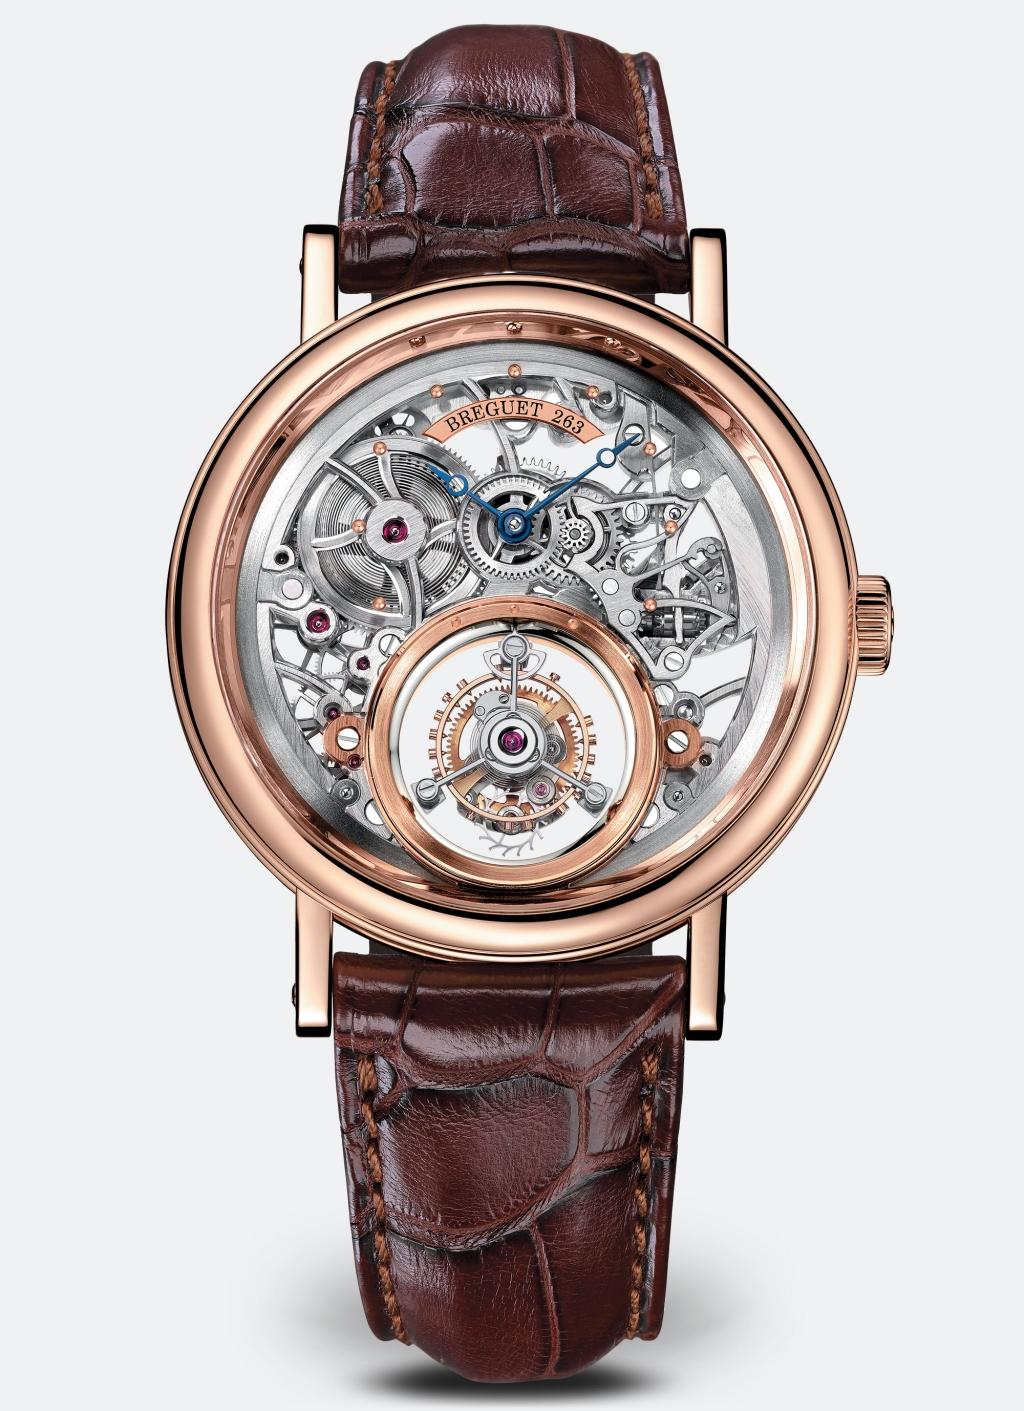 Classique Tourbillon Messidor 5335經典系列魔術水晶陀飛輪腕錶,價值:nt$ 4,980,000